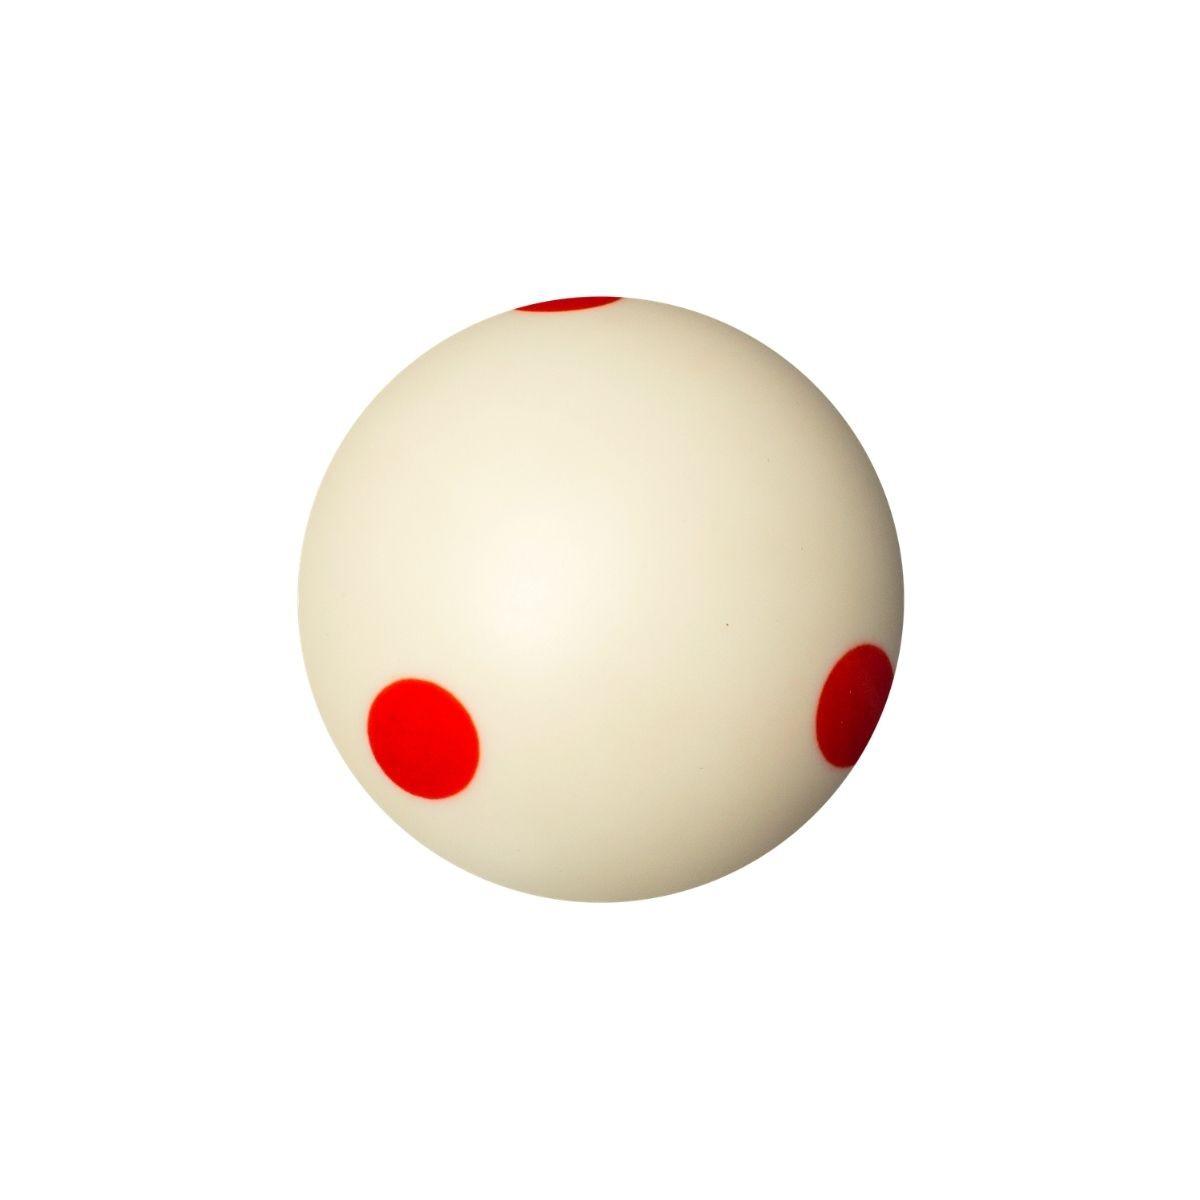 Bola de Treino Six Red Points 58mm para Bilhar Sinuca